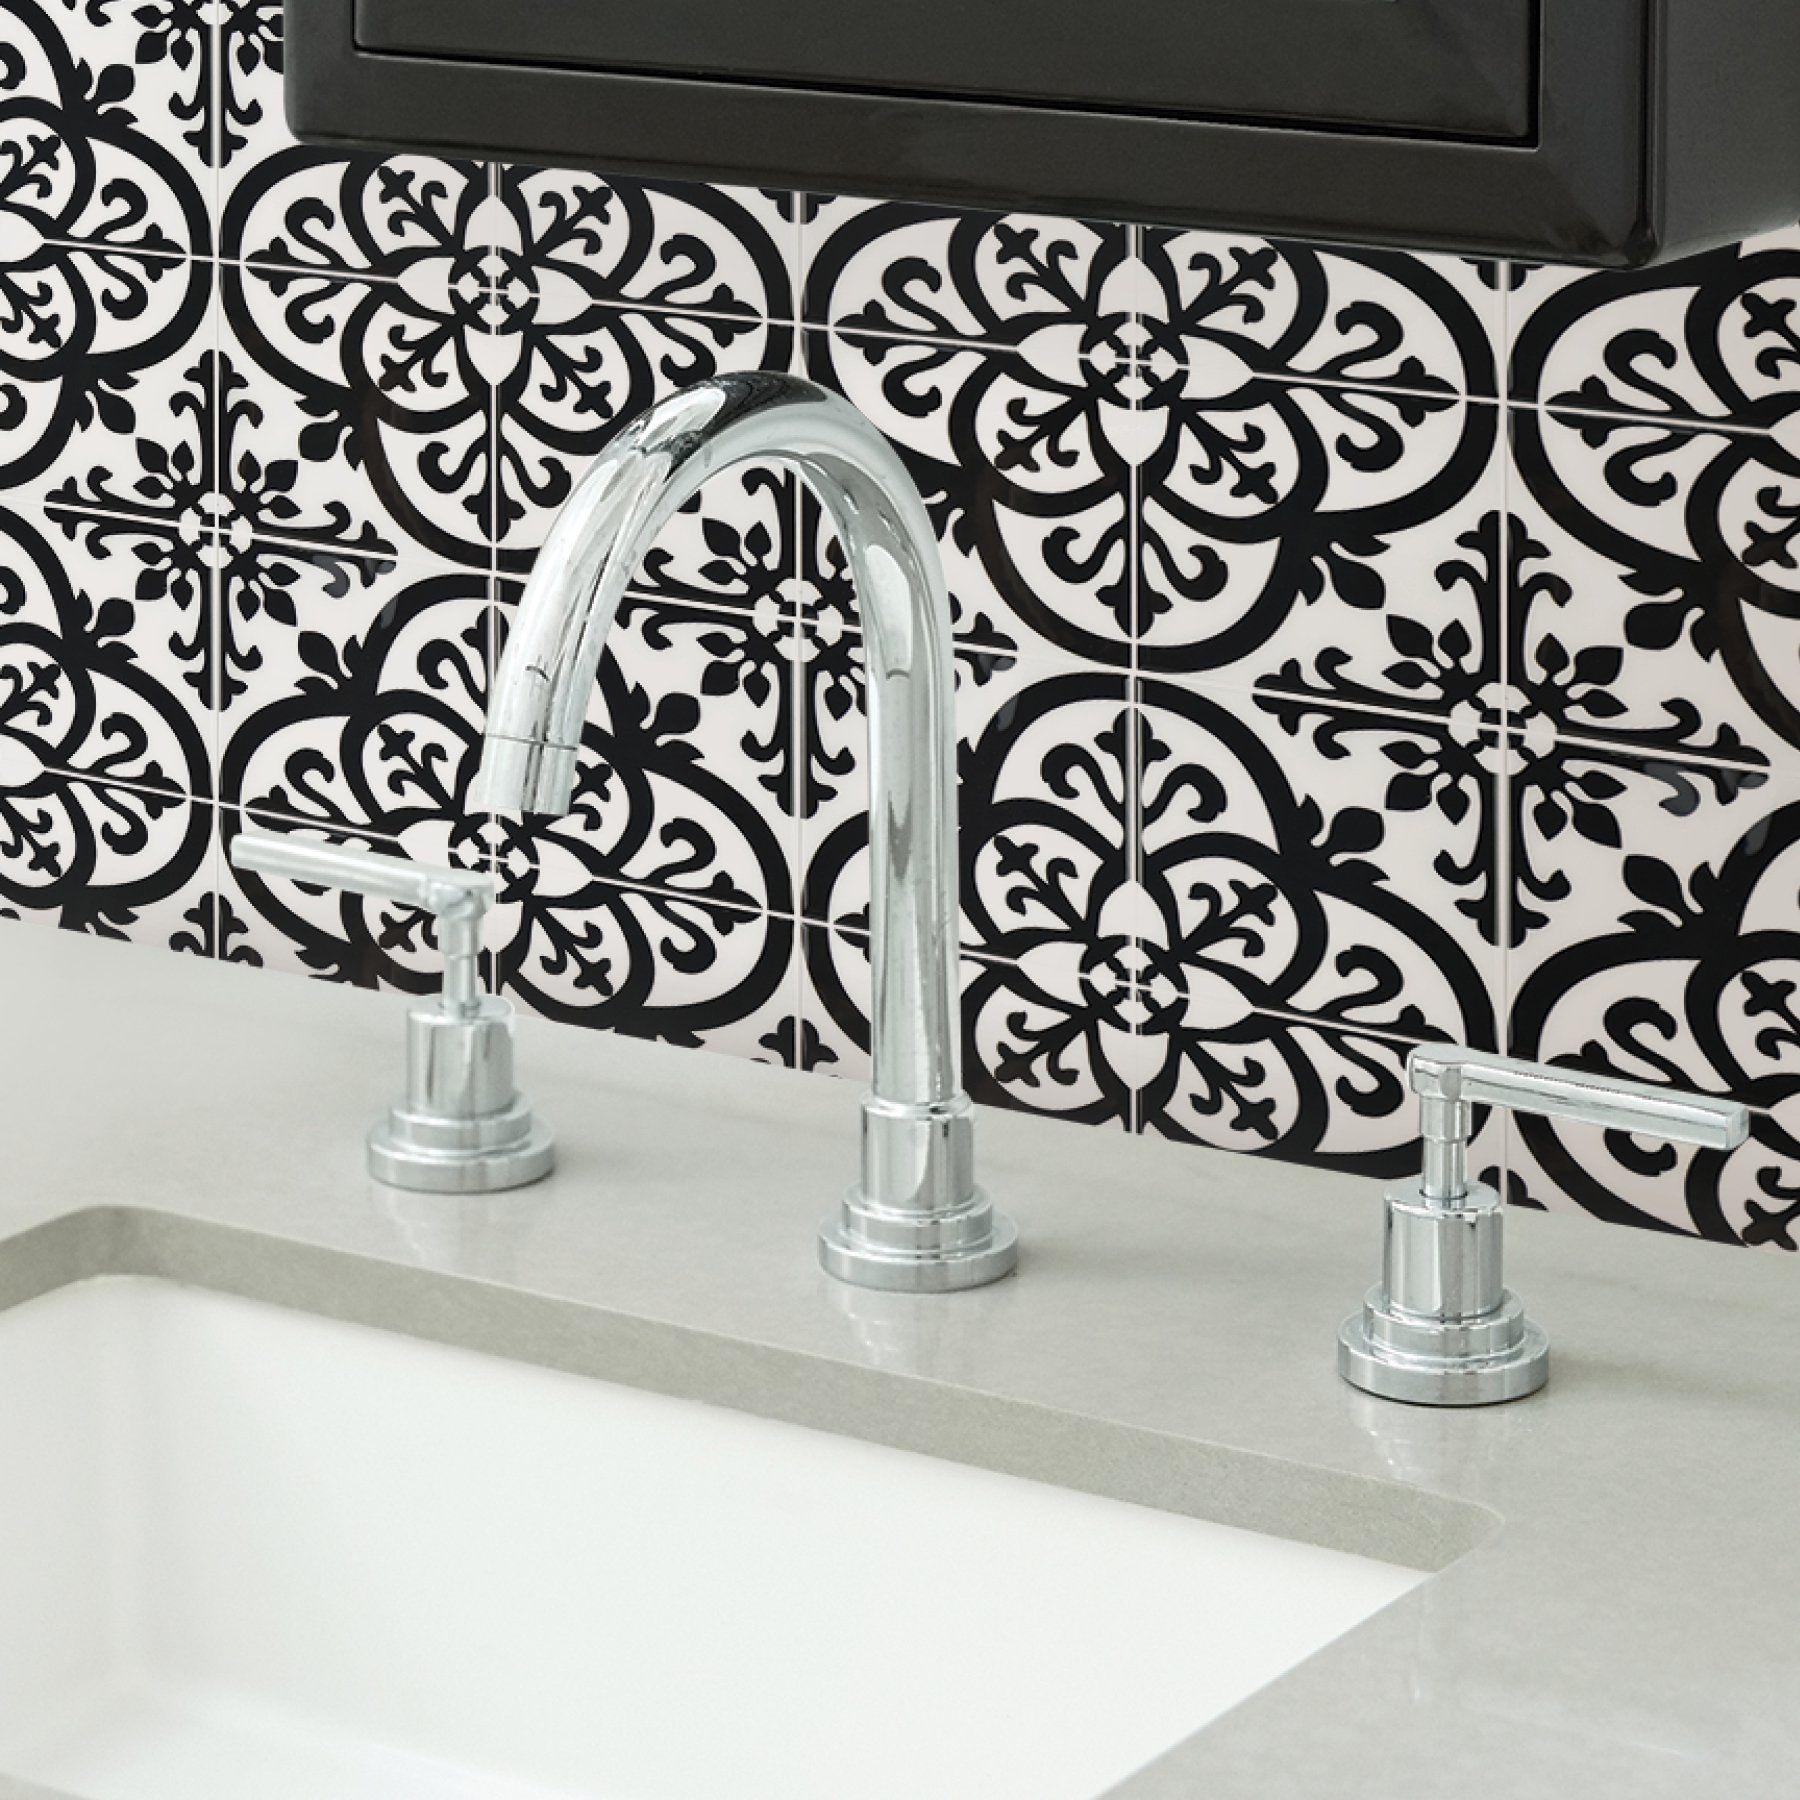 Inhome Avignon 10 In X 10 In Peel And Stick Resin Backsplash Tiles 4 Pack Walmart Com In 2021 Self Adhesive Backsplash Self Adhesive Backsplash Tiles Tile Backsplash